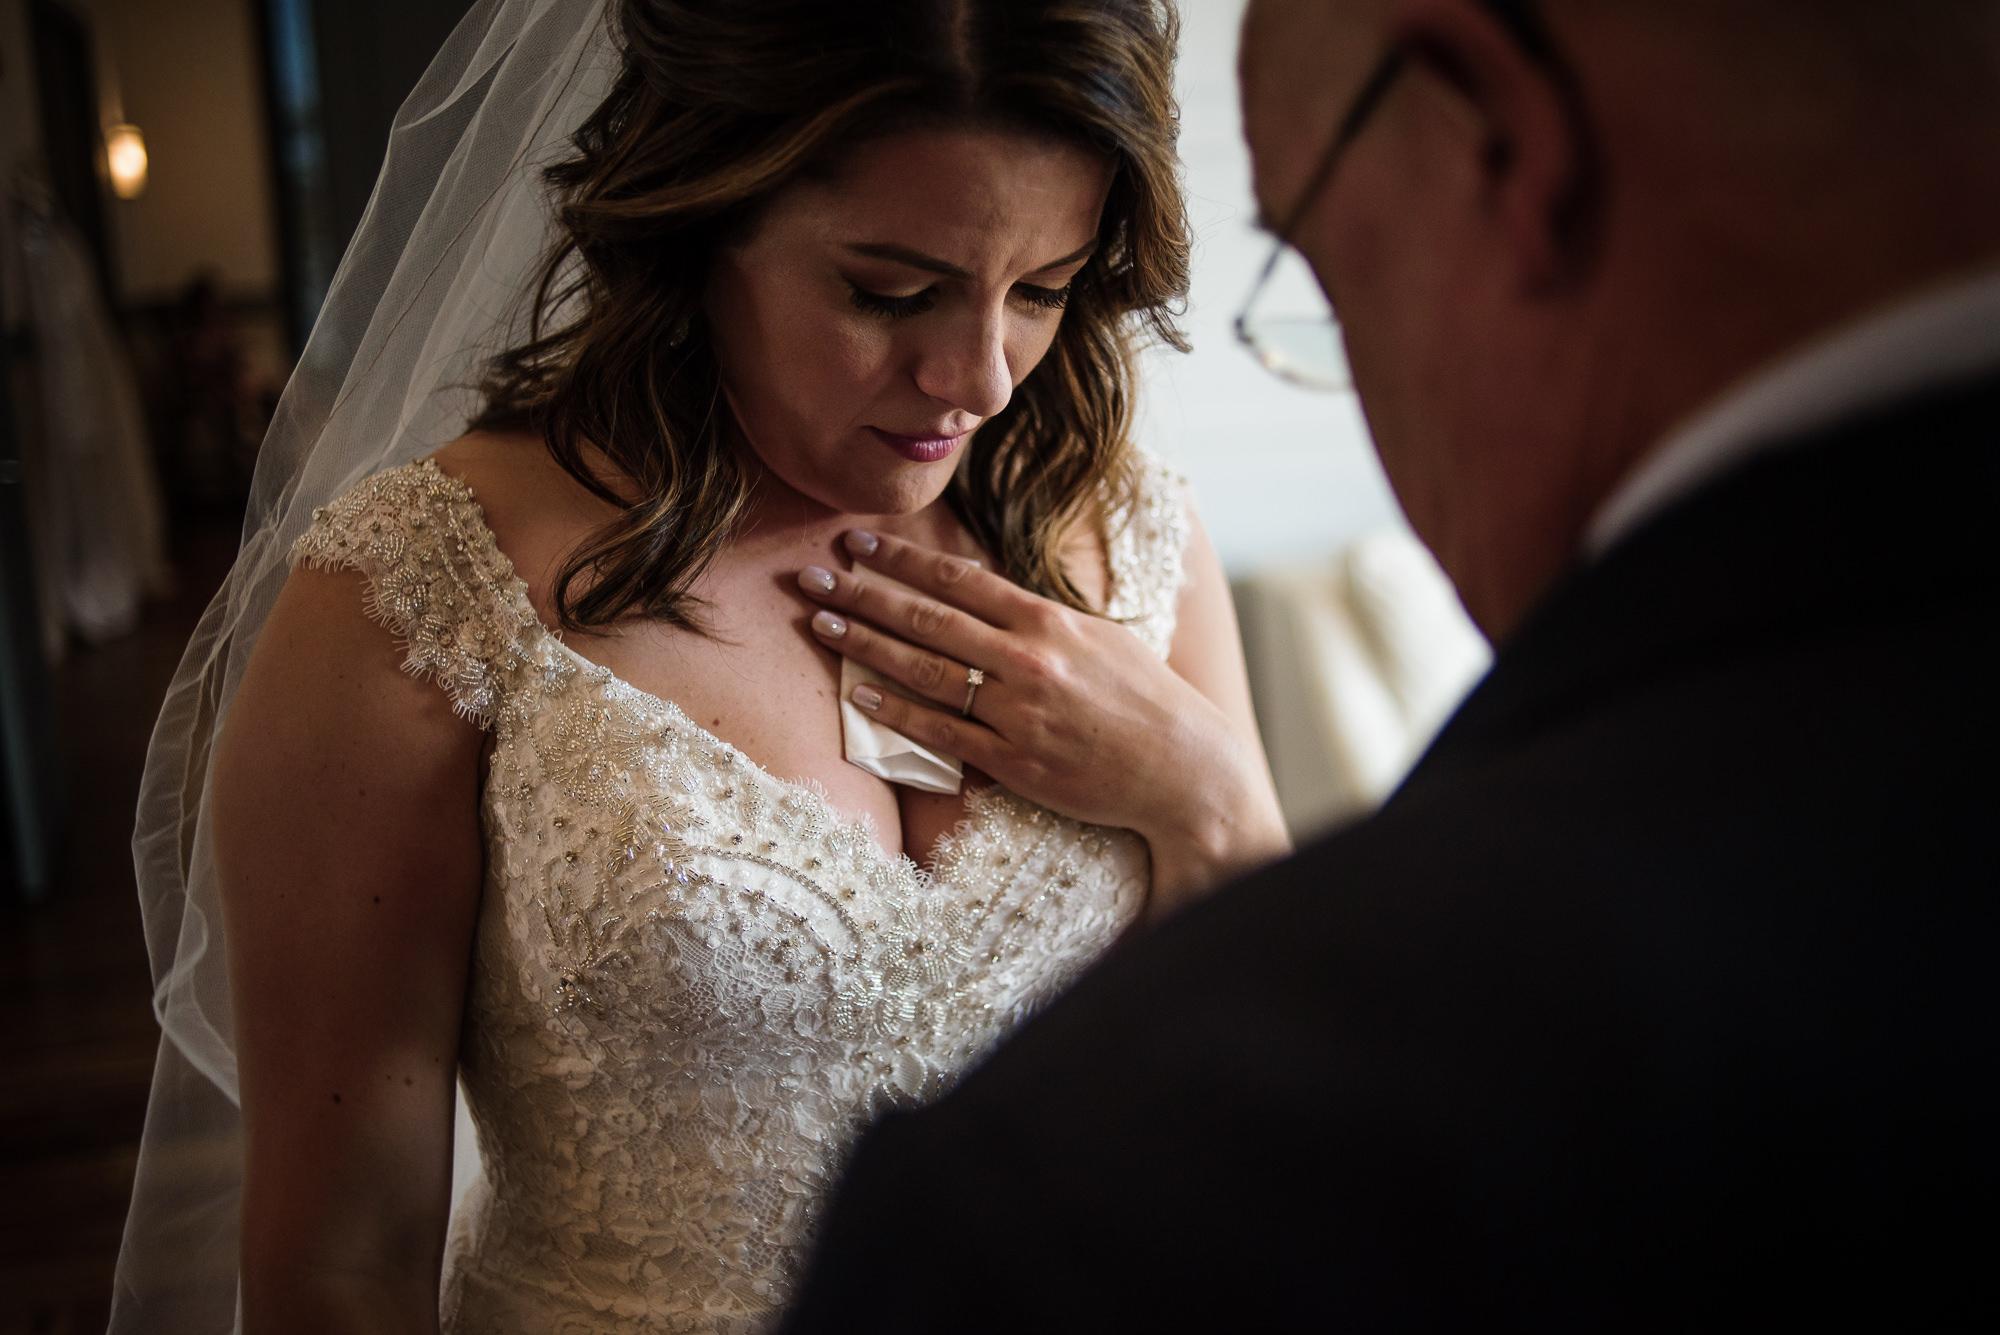 KEVIN-STACY-NOAHS-EVENT-VENUE-OMAHA-WEDDING-PHOTOGRAPHER-008.jpg